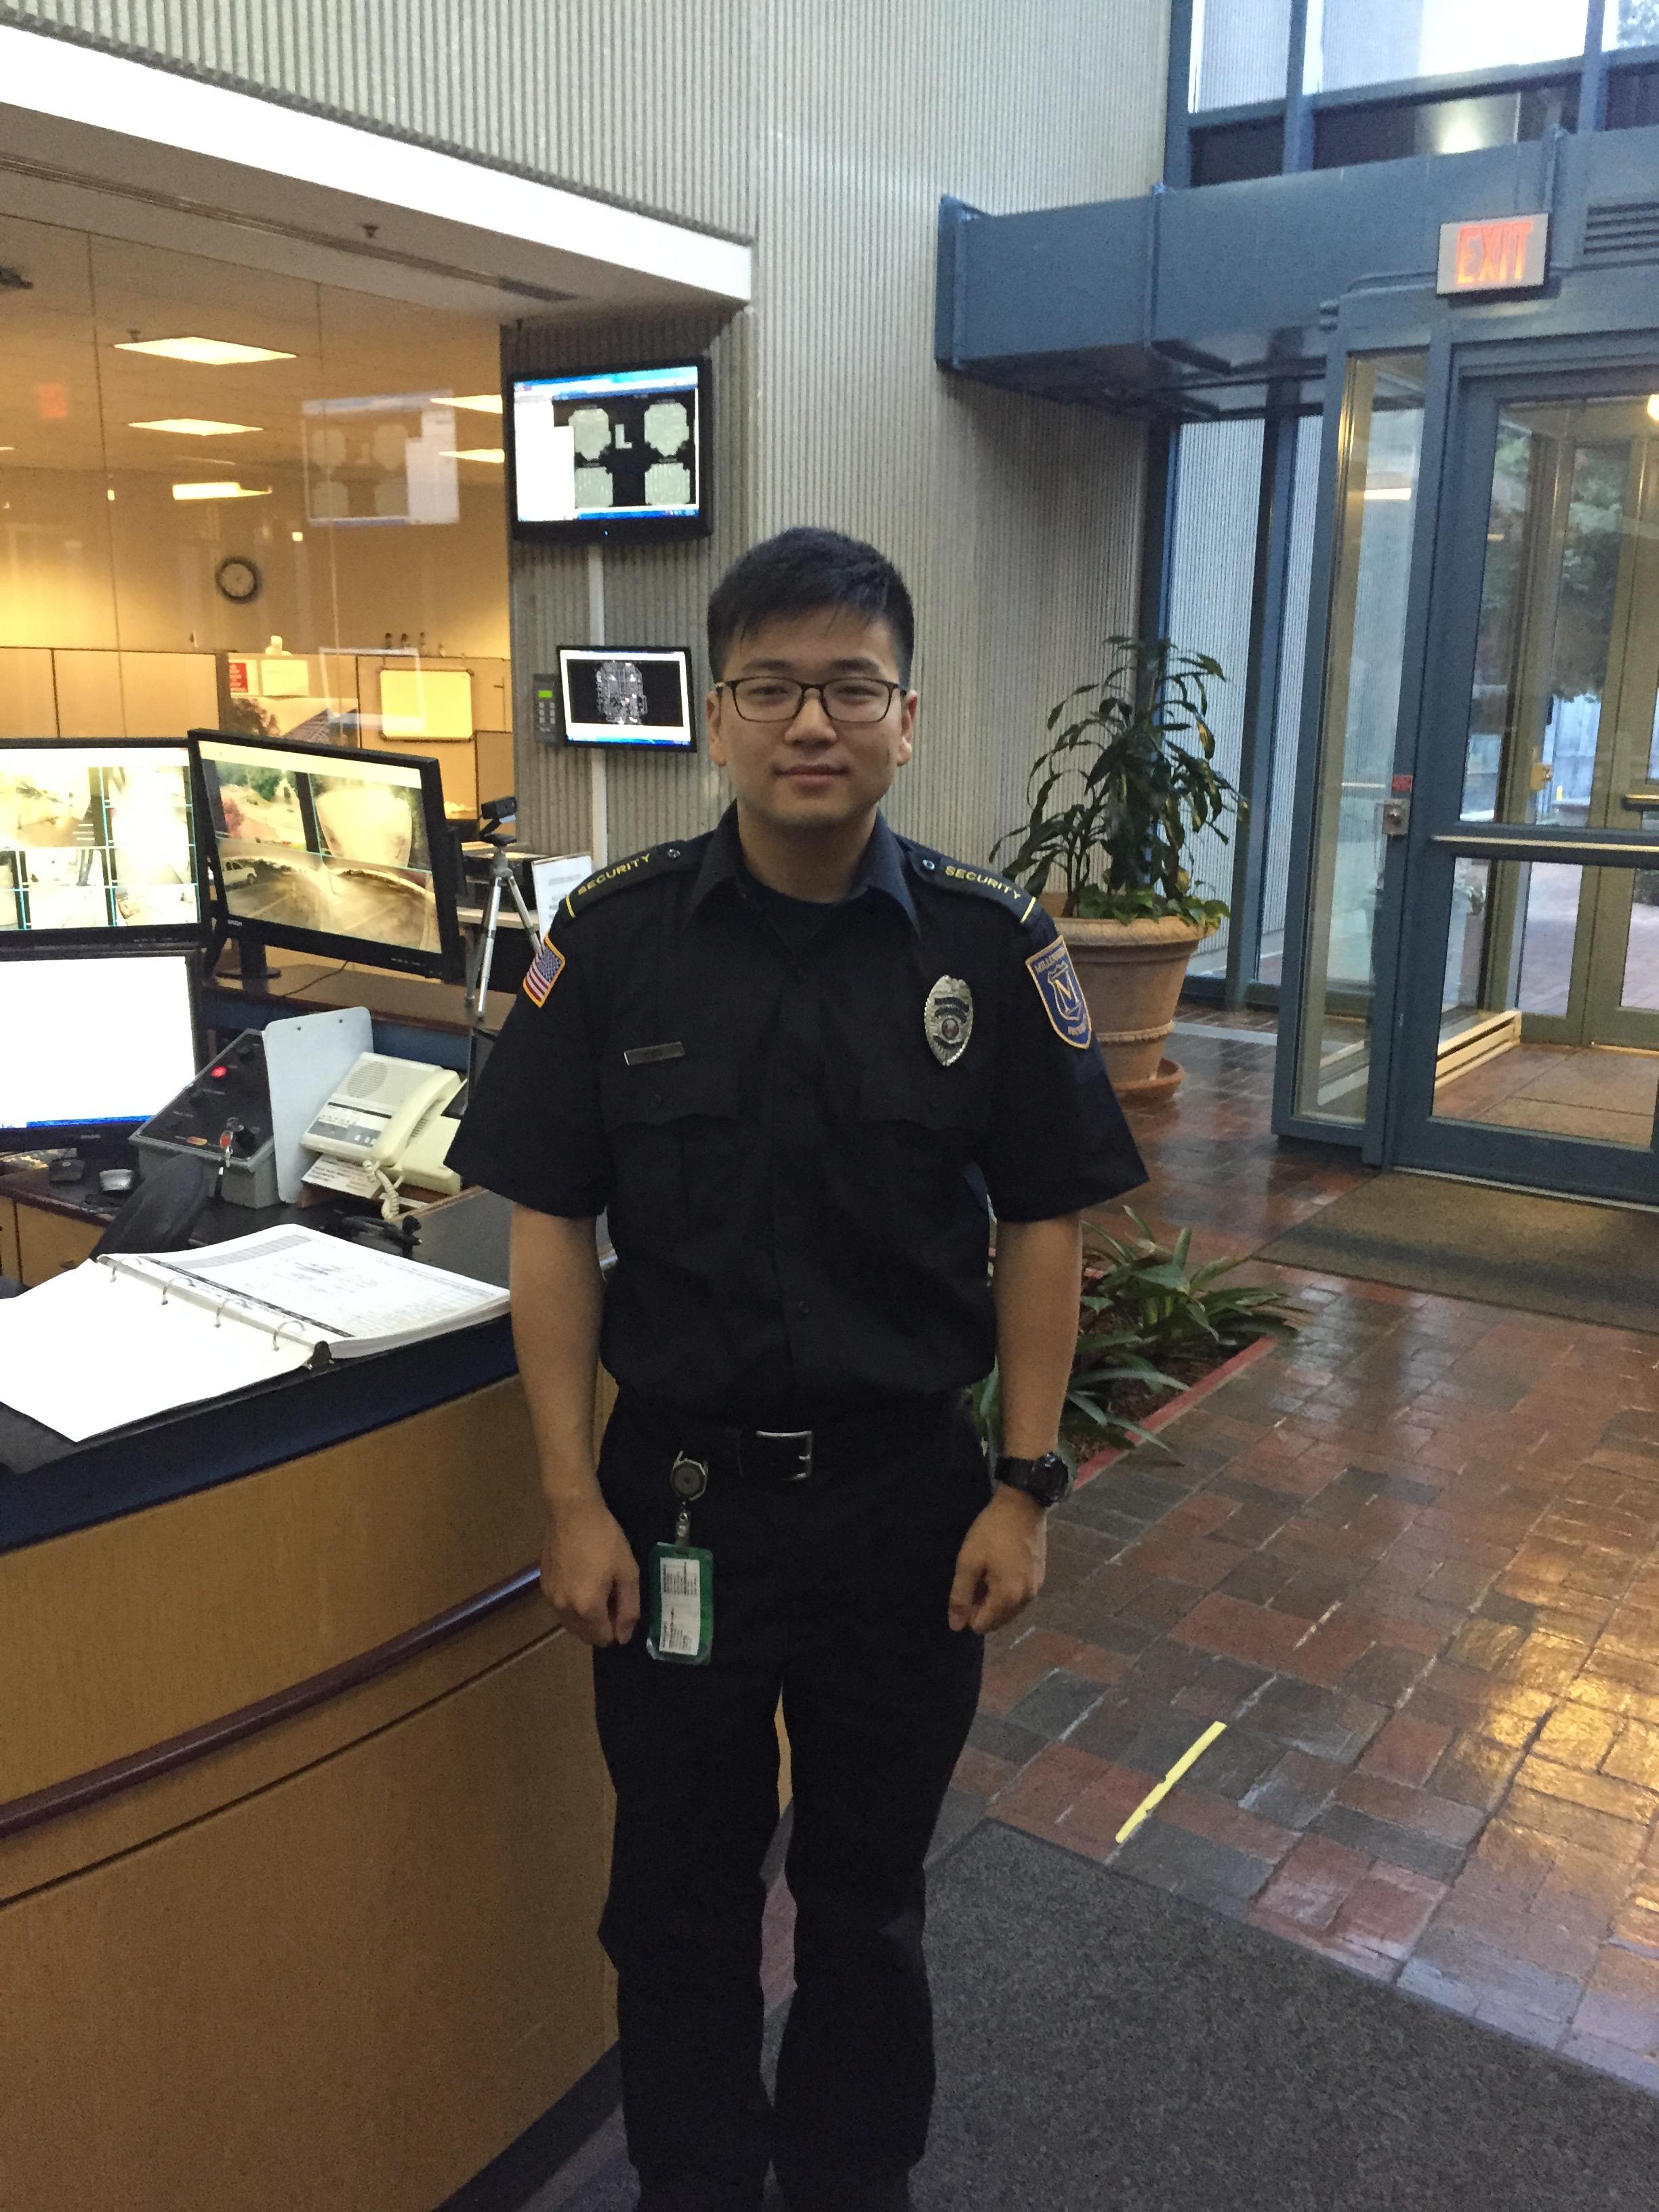 Millennium Security Services Data Center Image Proview